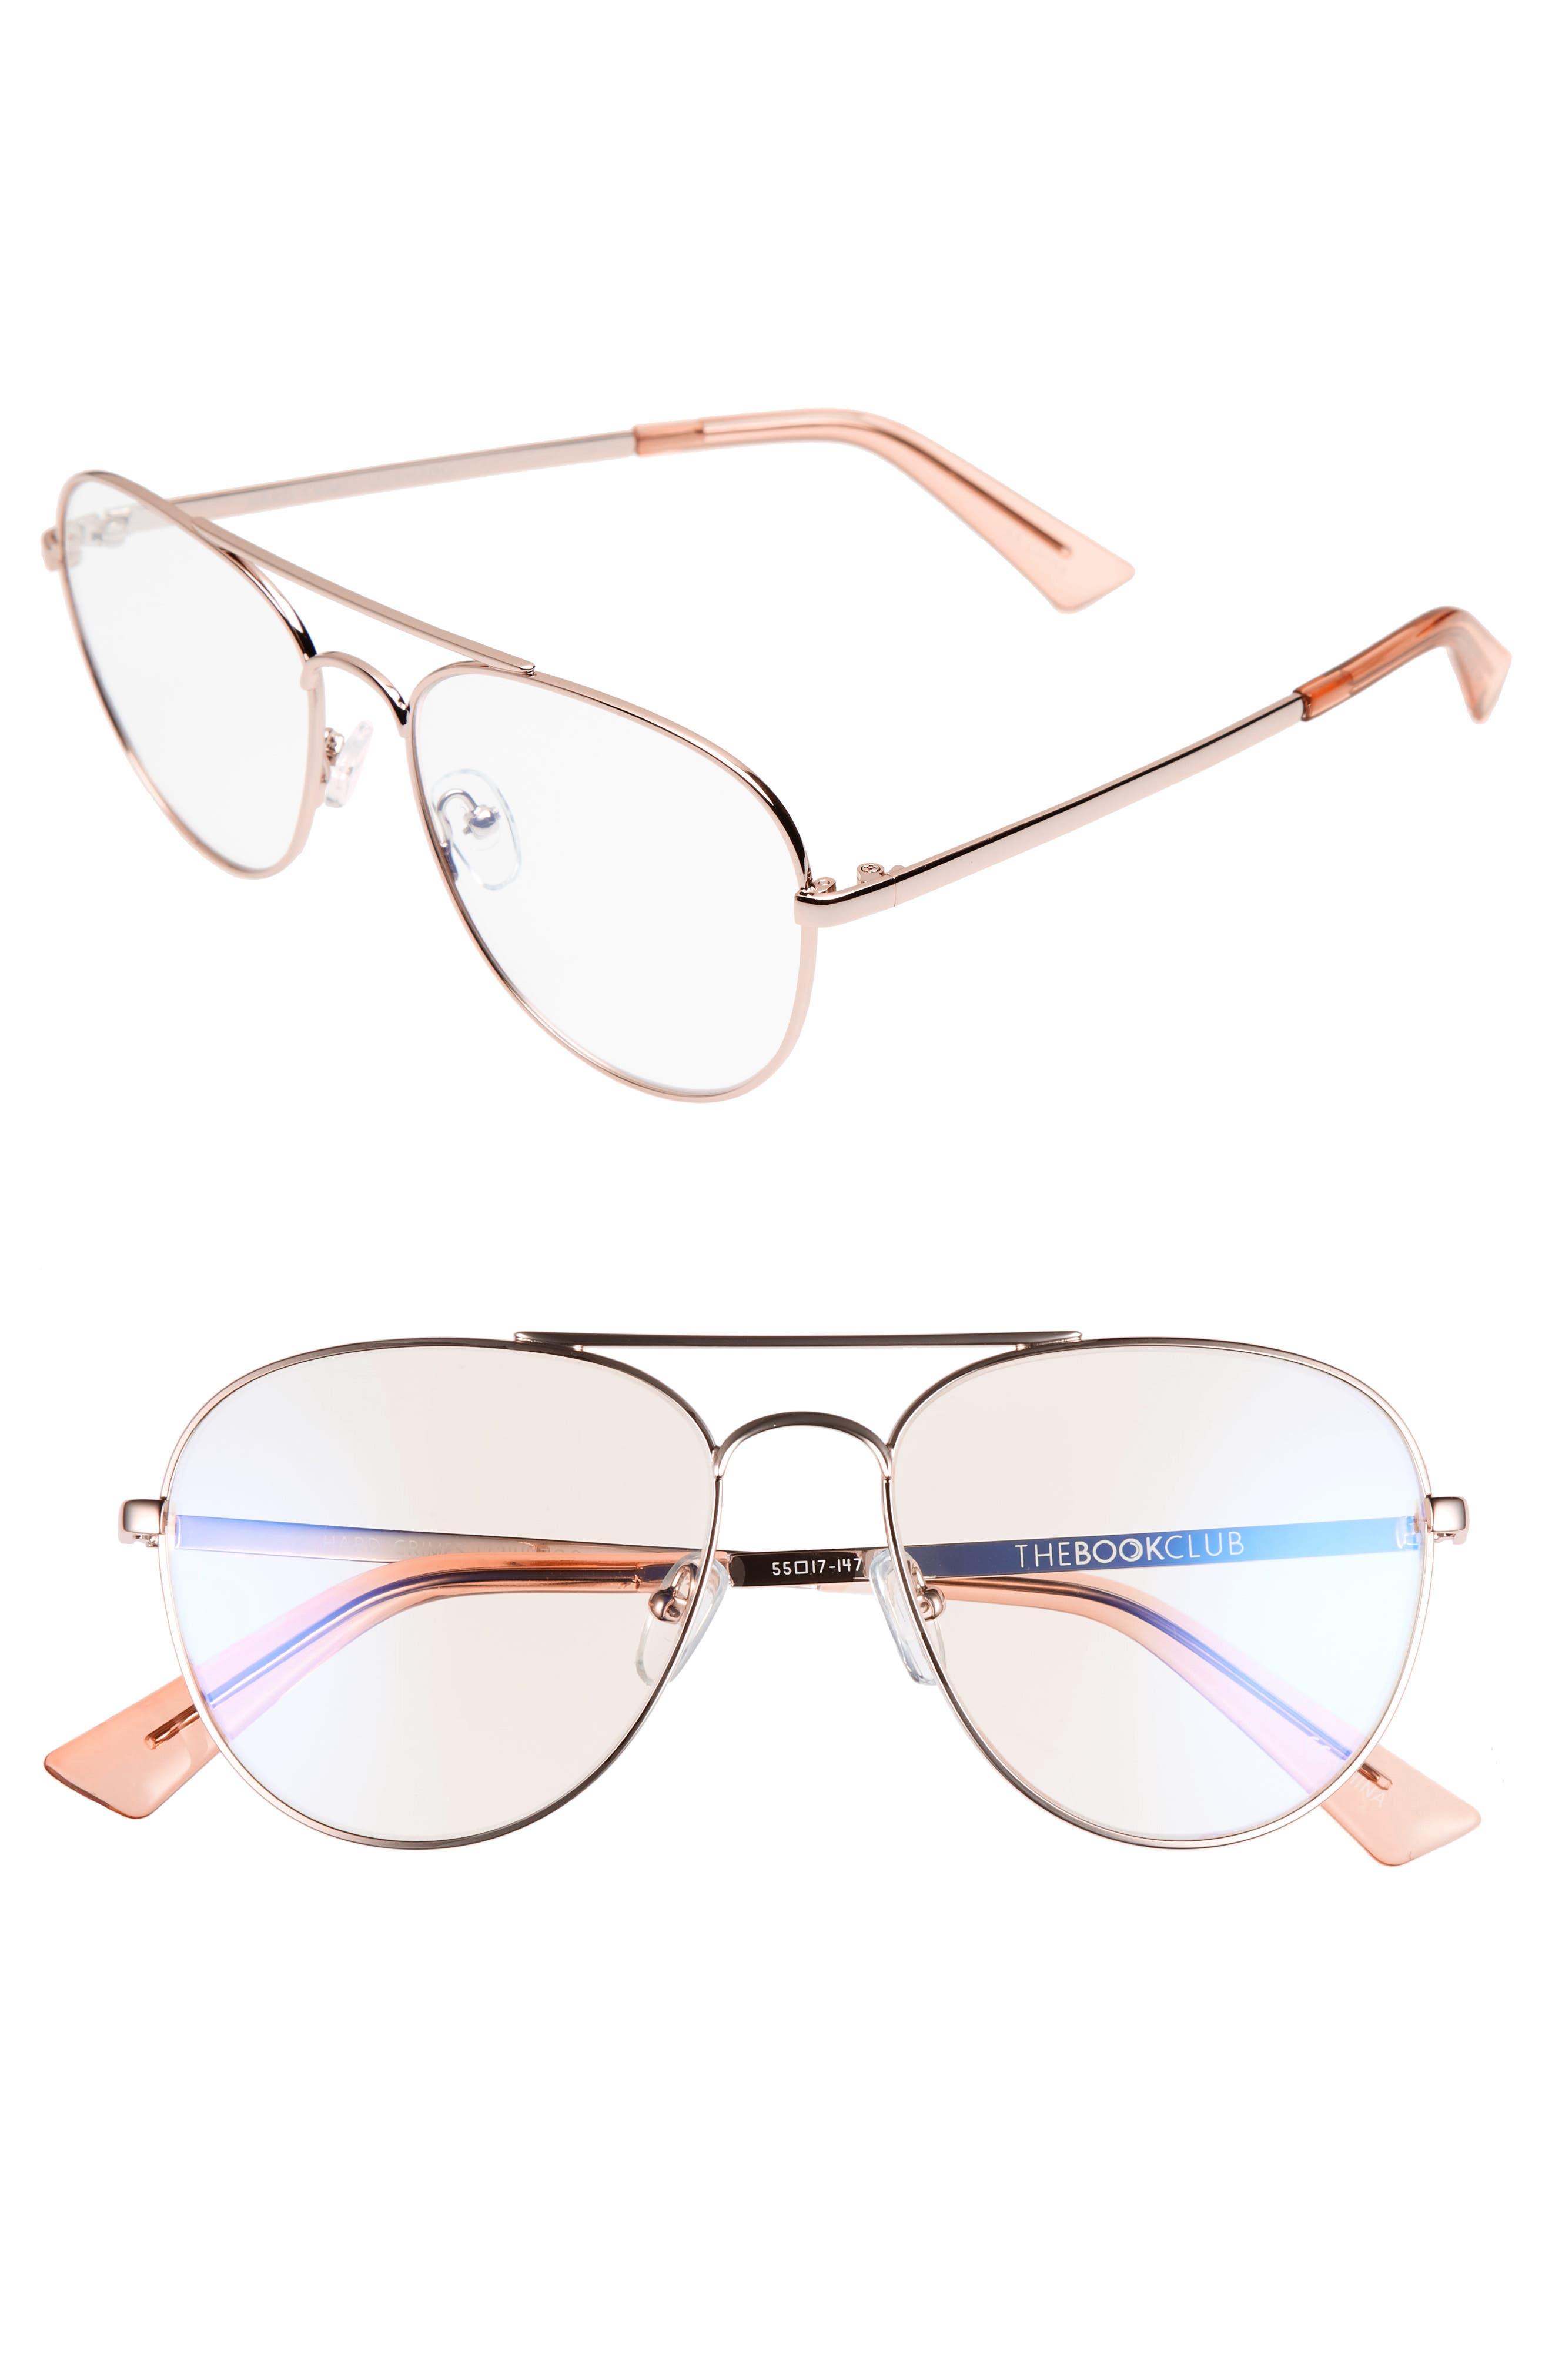 Hard Crimes 55mm Aviator Reading Glasses,                         Main,                         color, ROSE GOLD